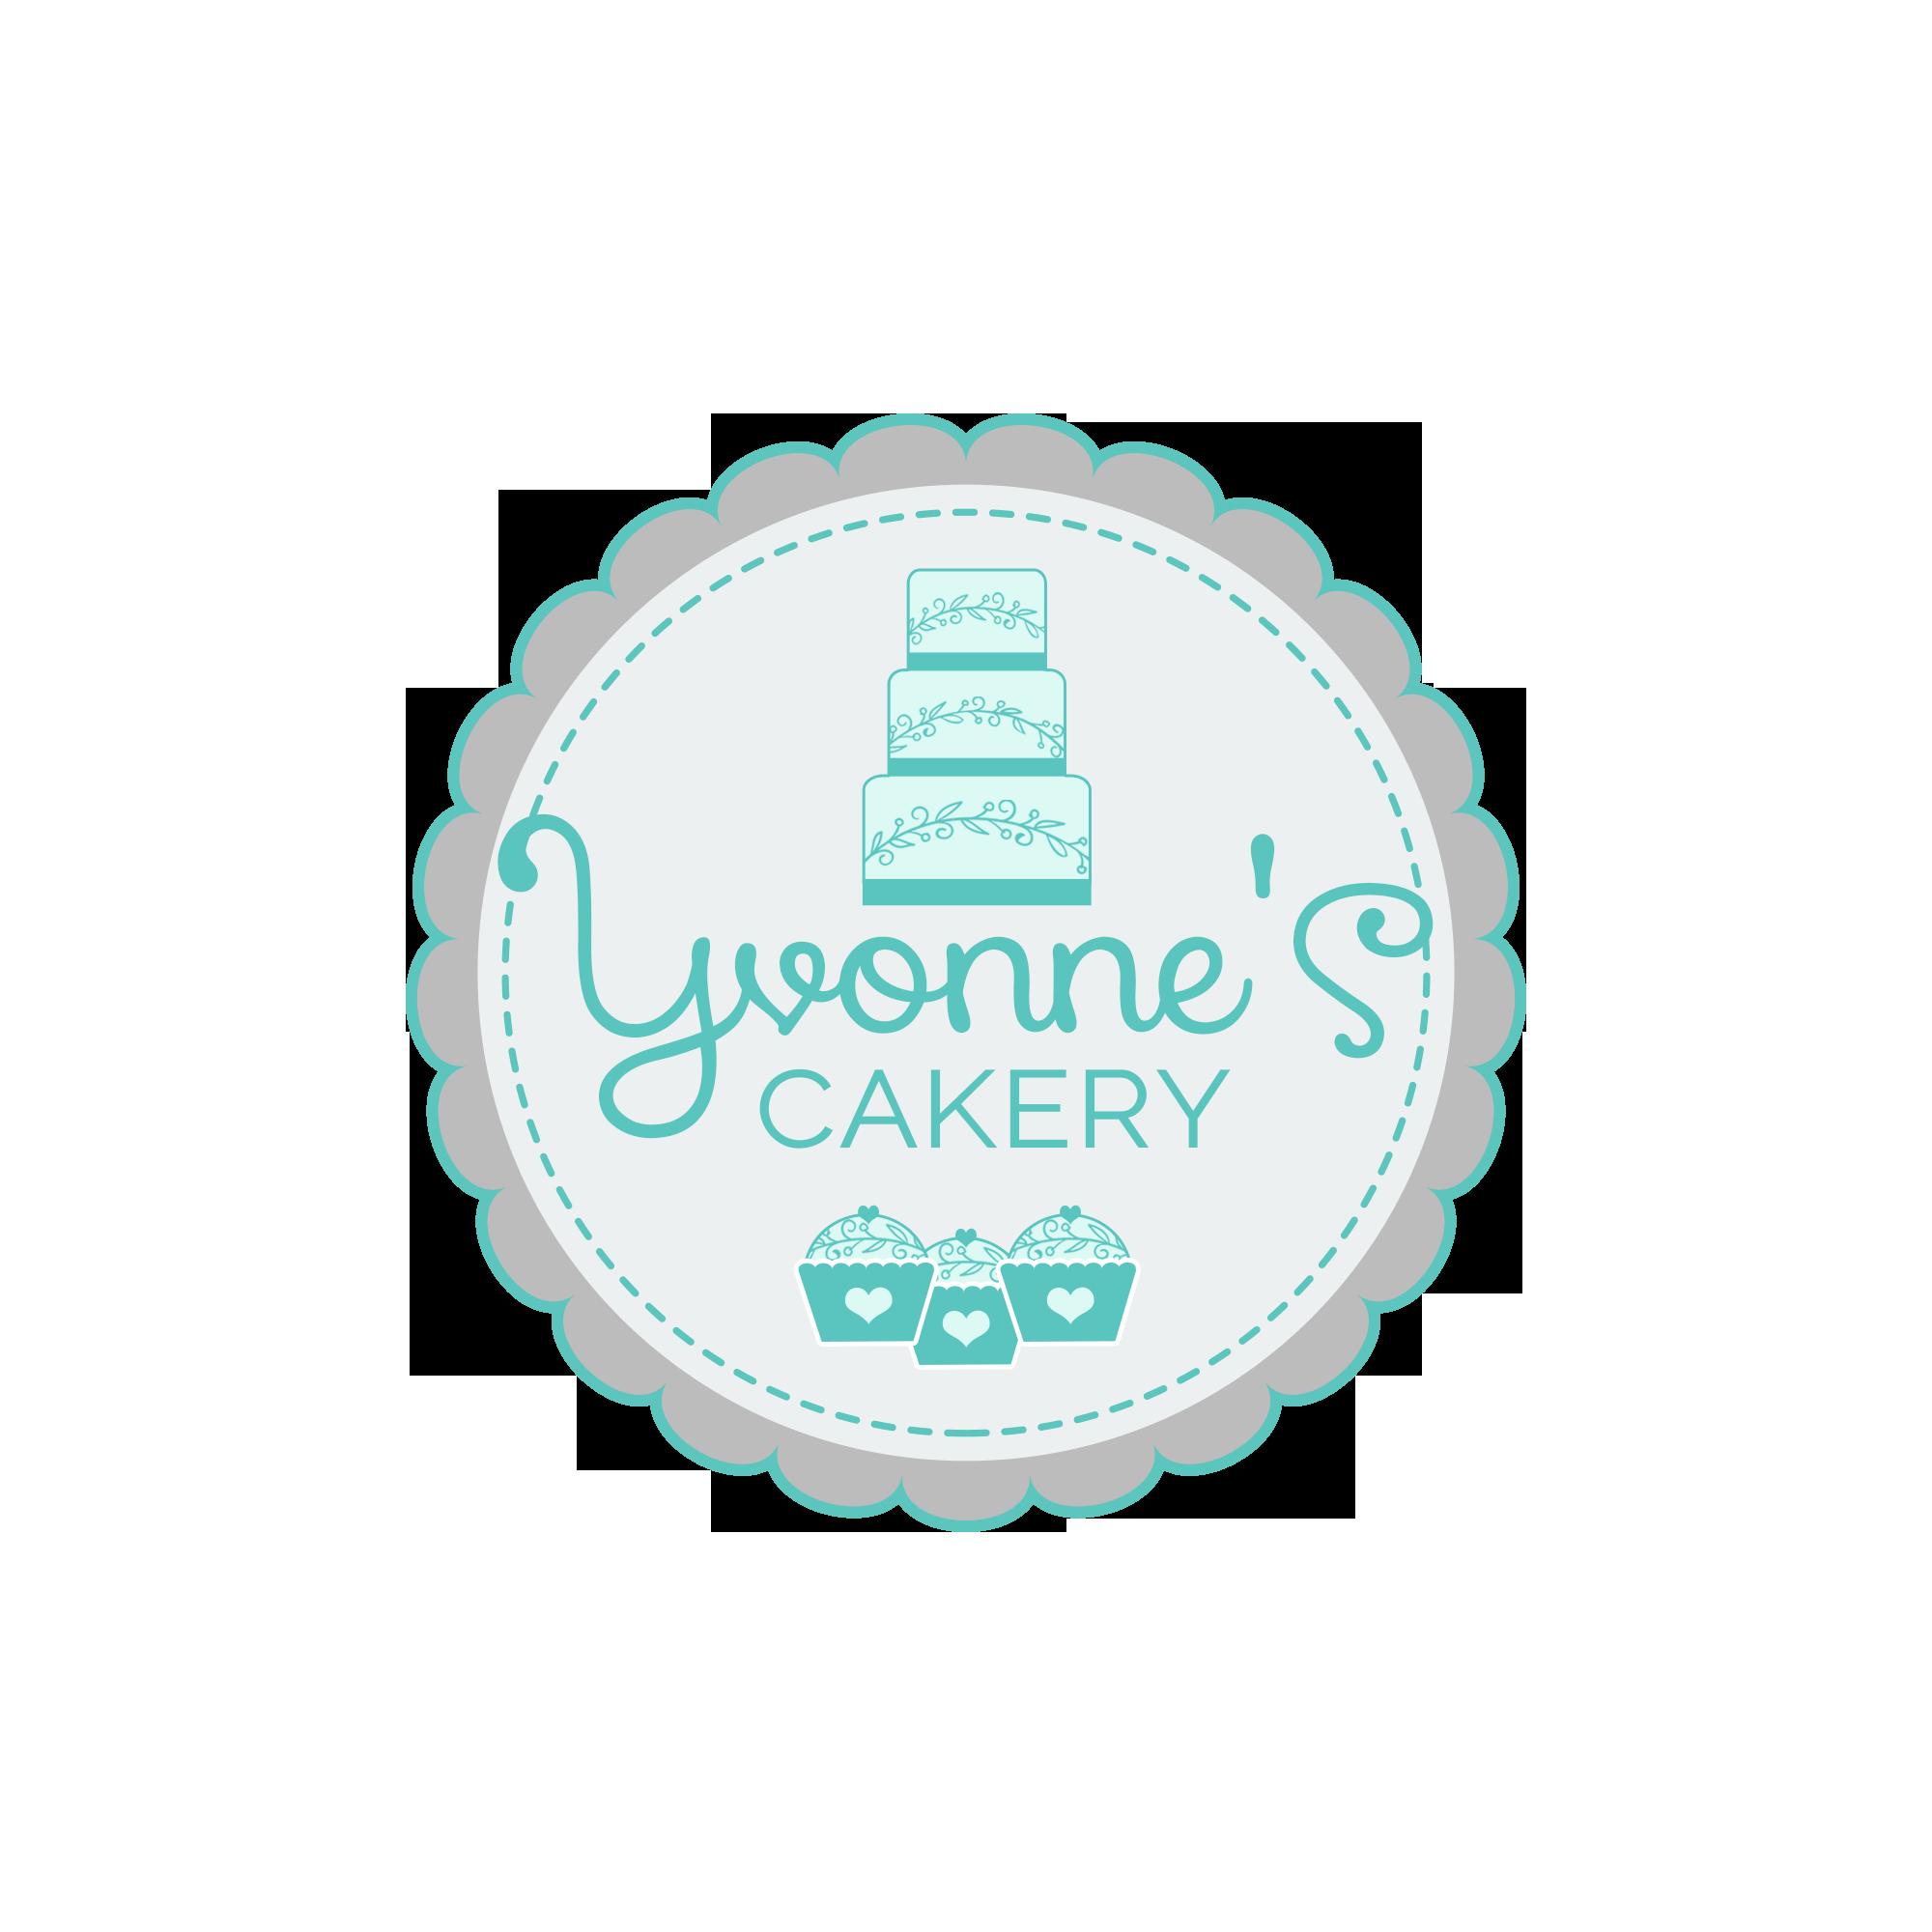 Yvonne's Cakery Ltd